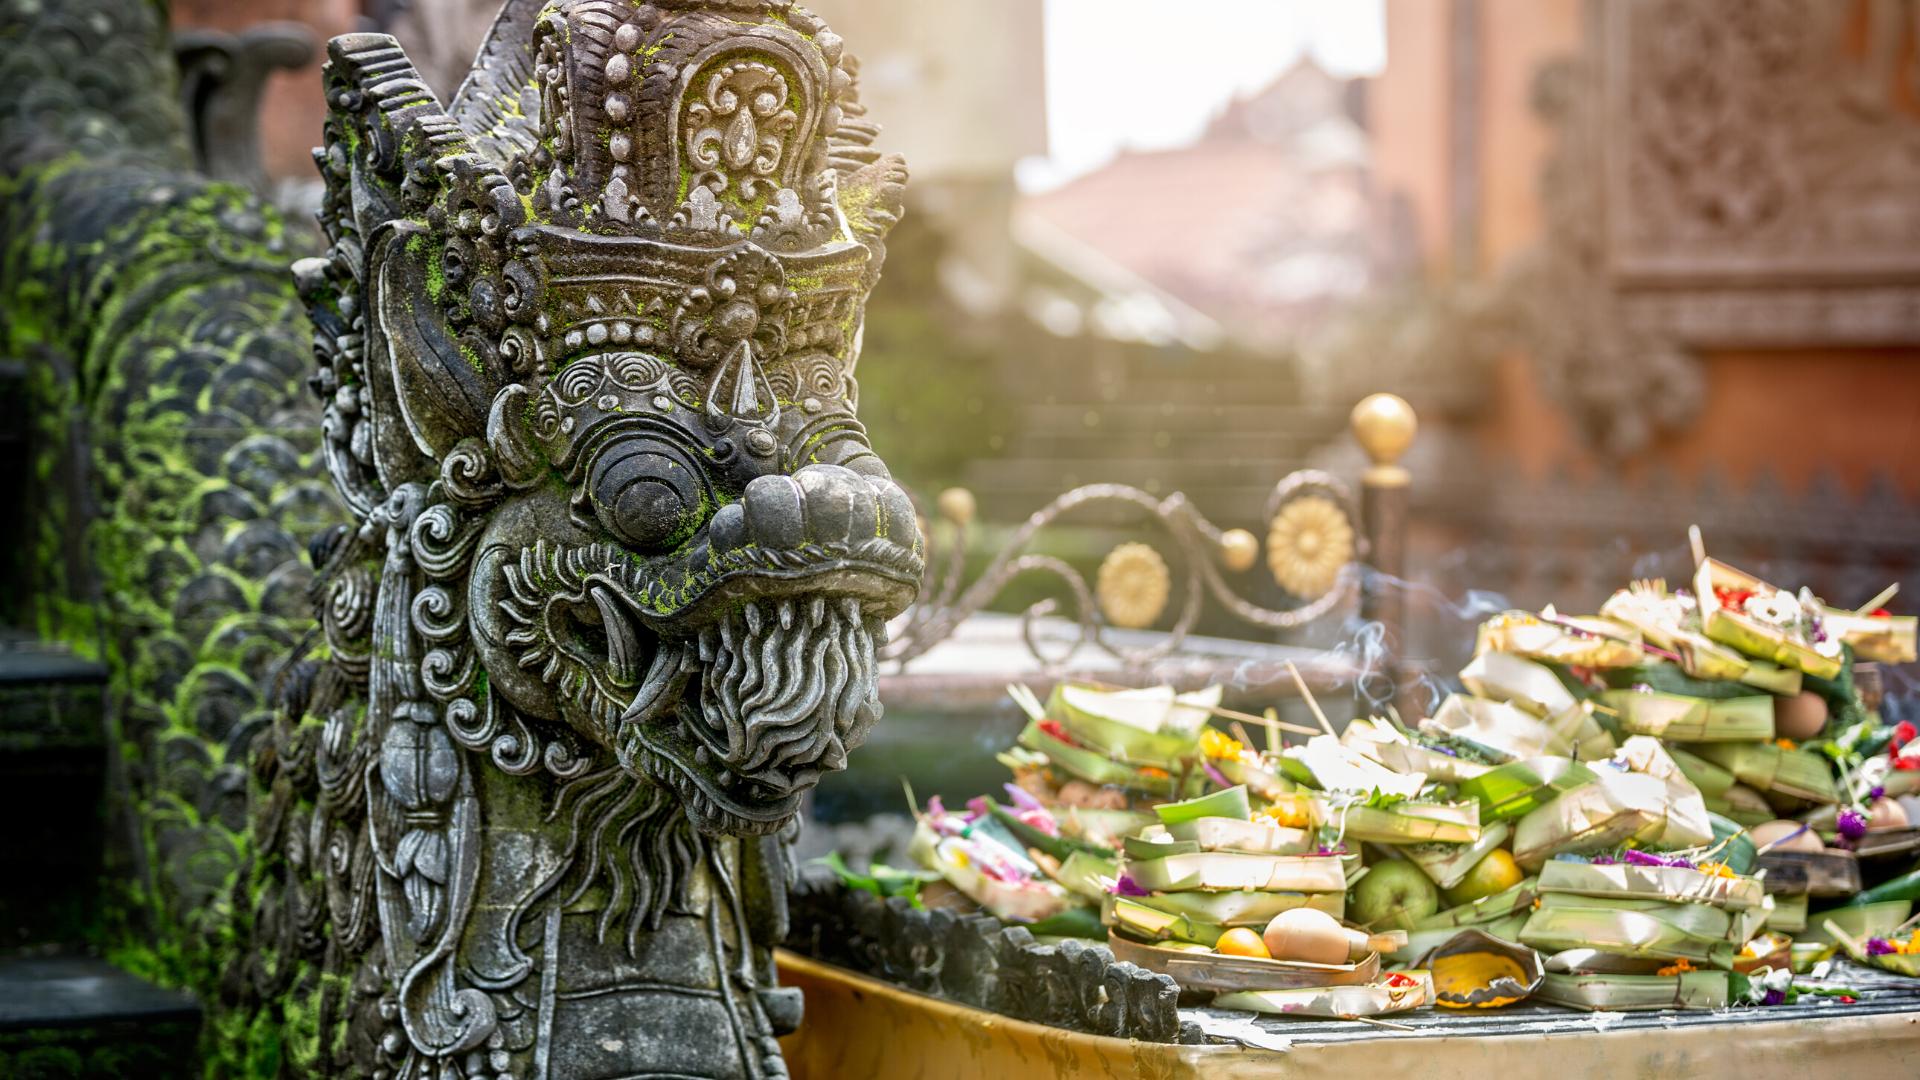 DestinationTEFL_Bali_10